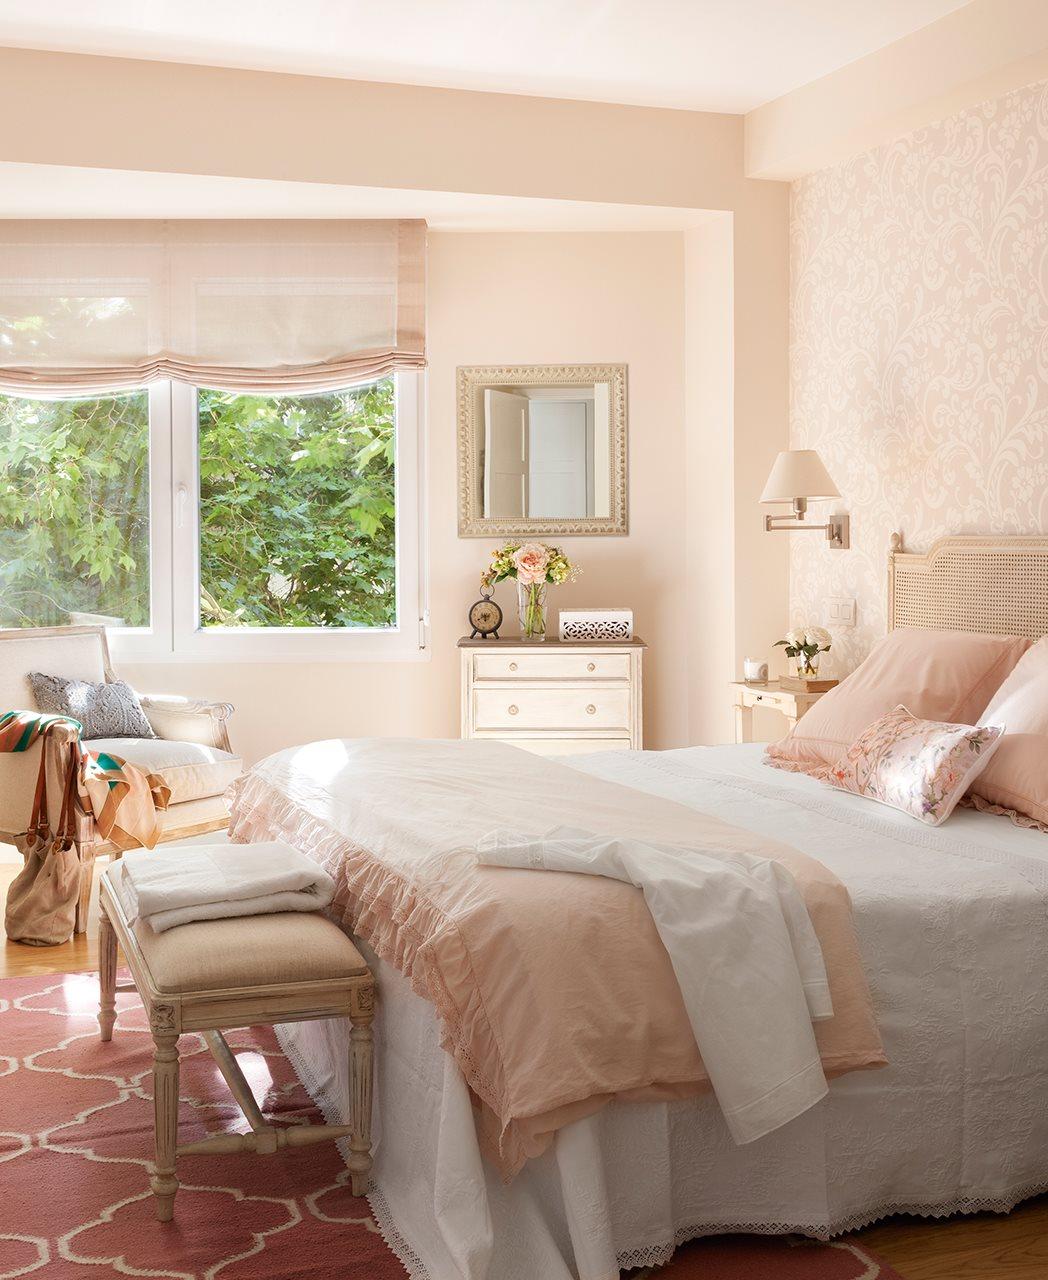 5 ideas para decorar dormitorios dise o dormitorios for Decoracion de dormitorios